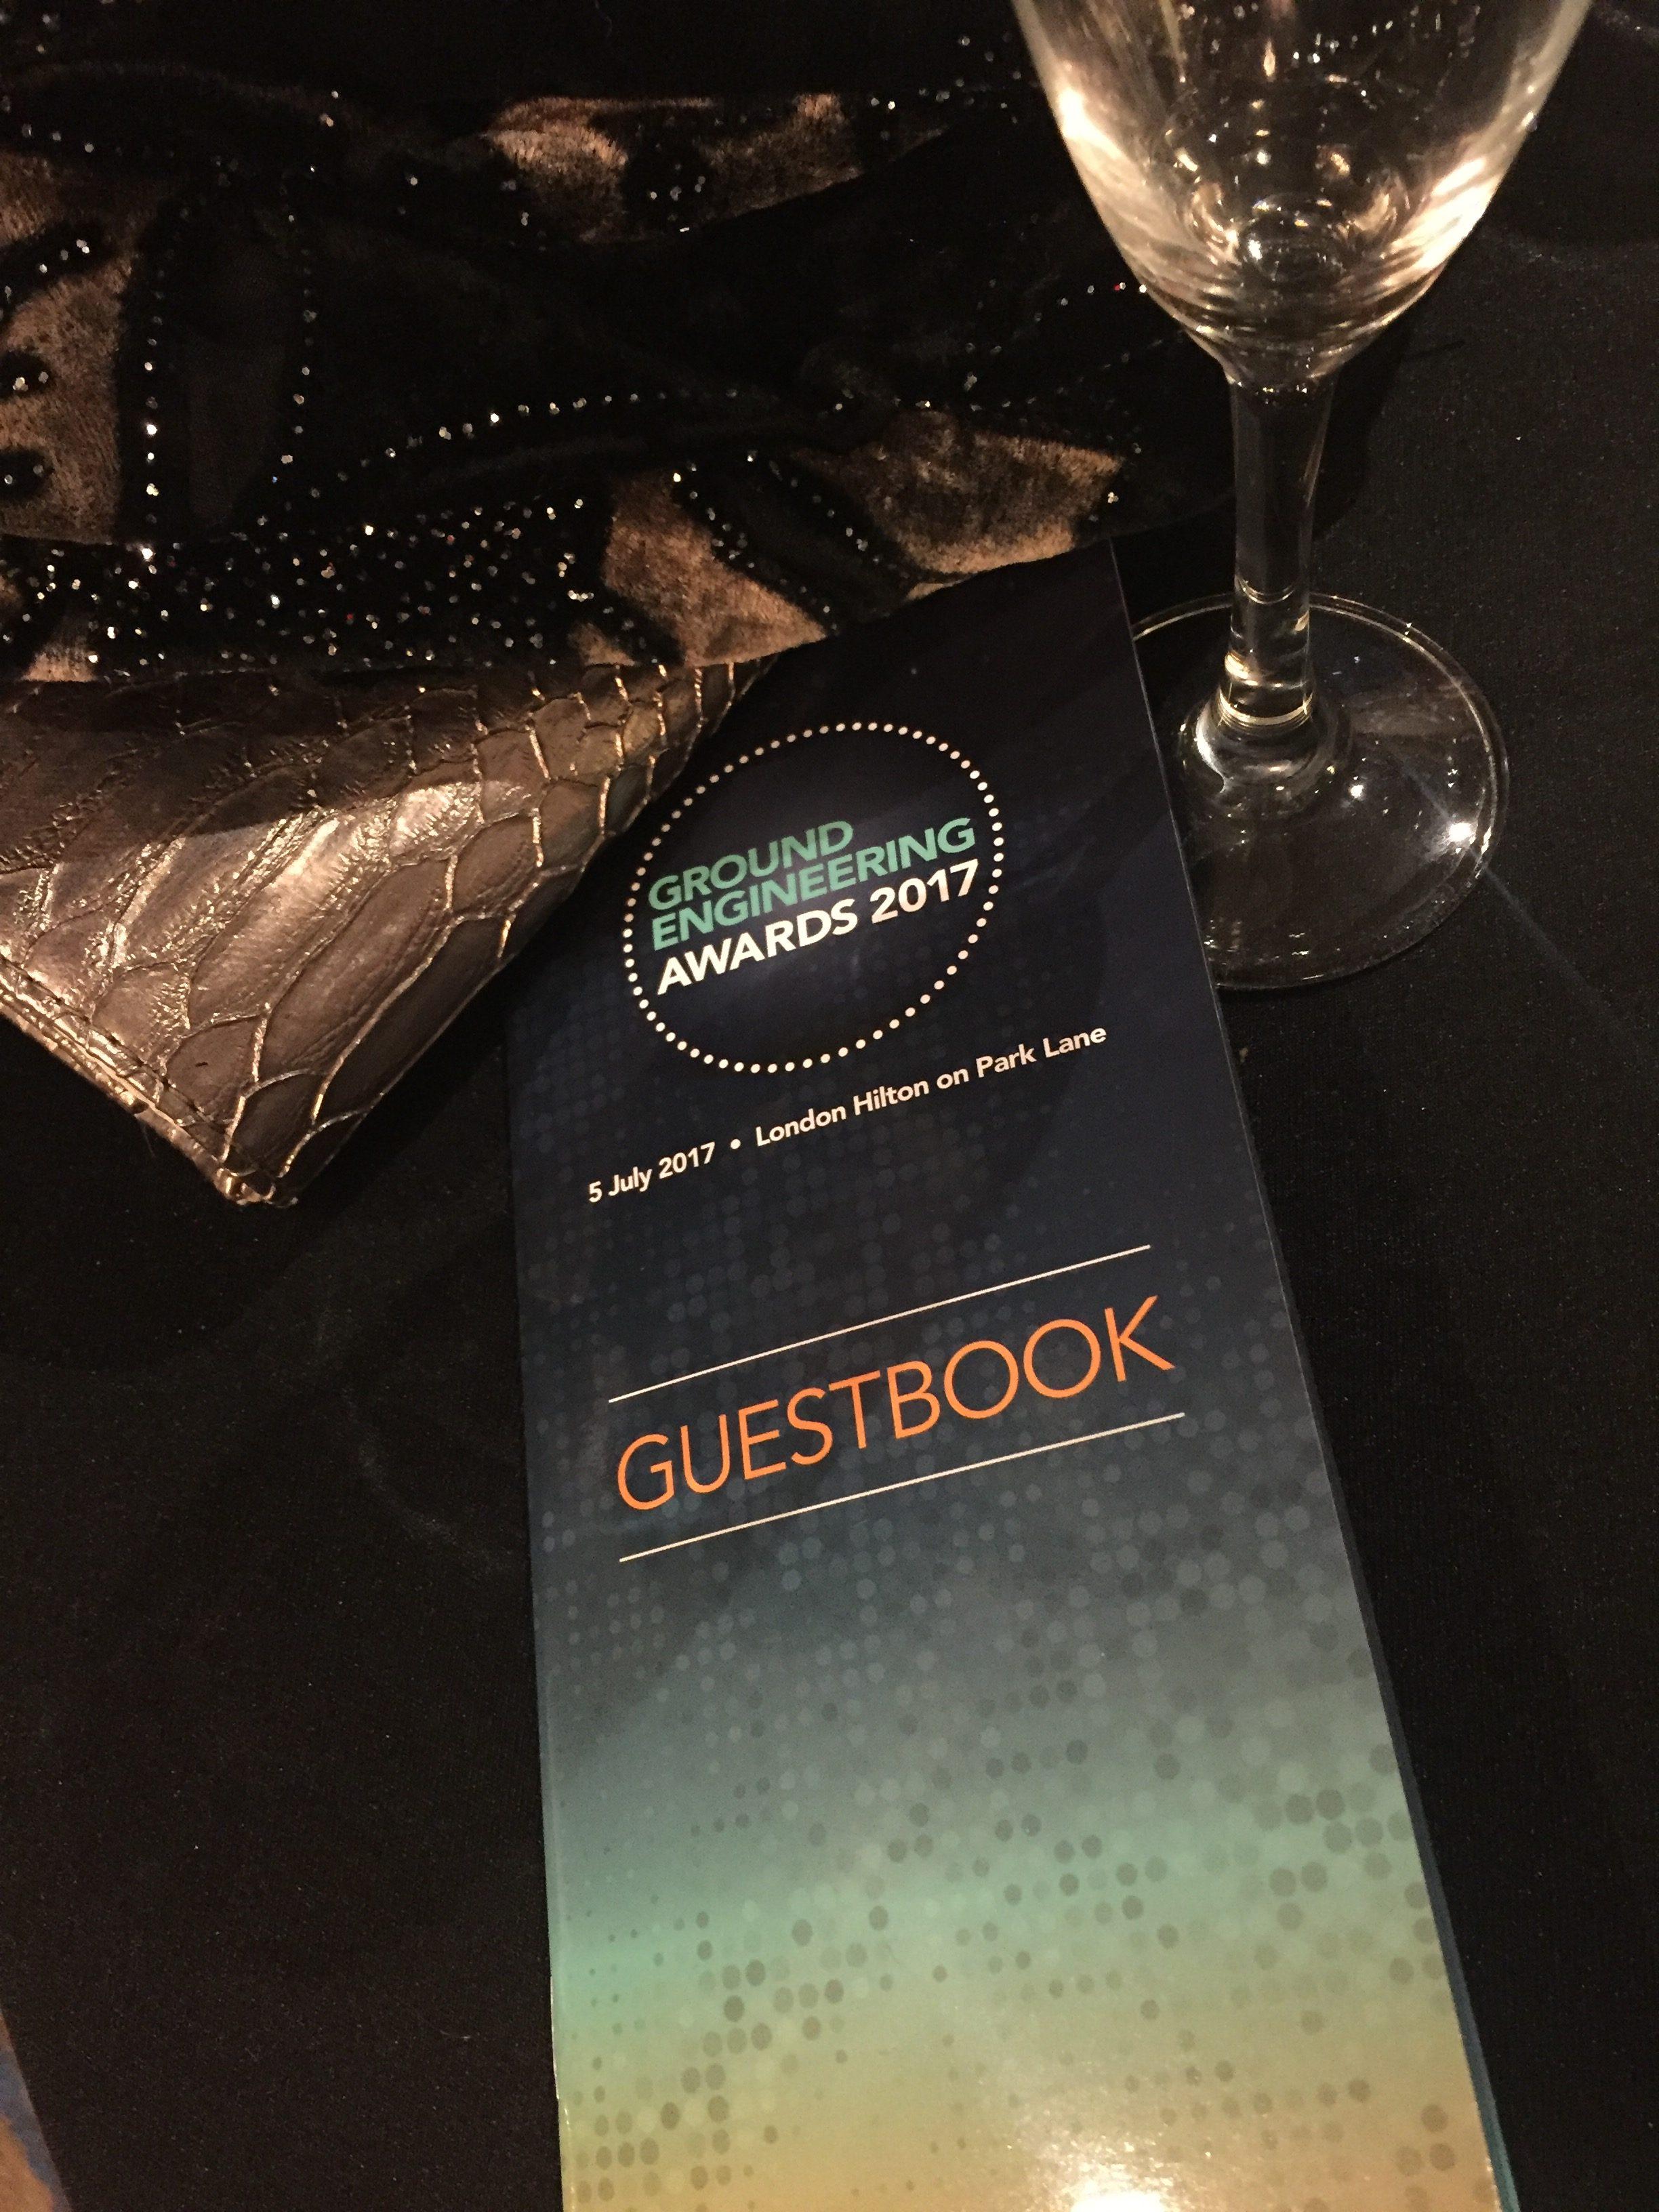 GE Awards Guestbook